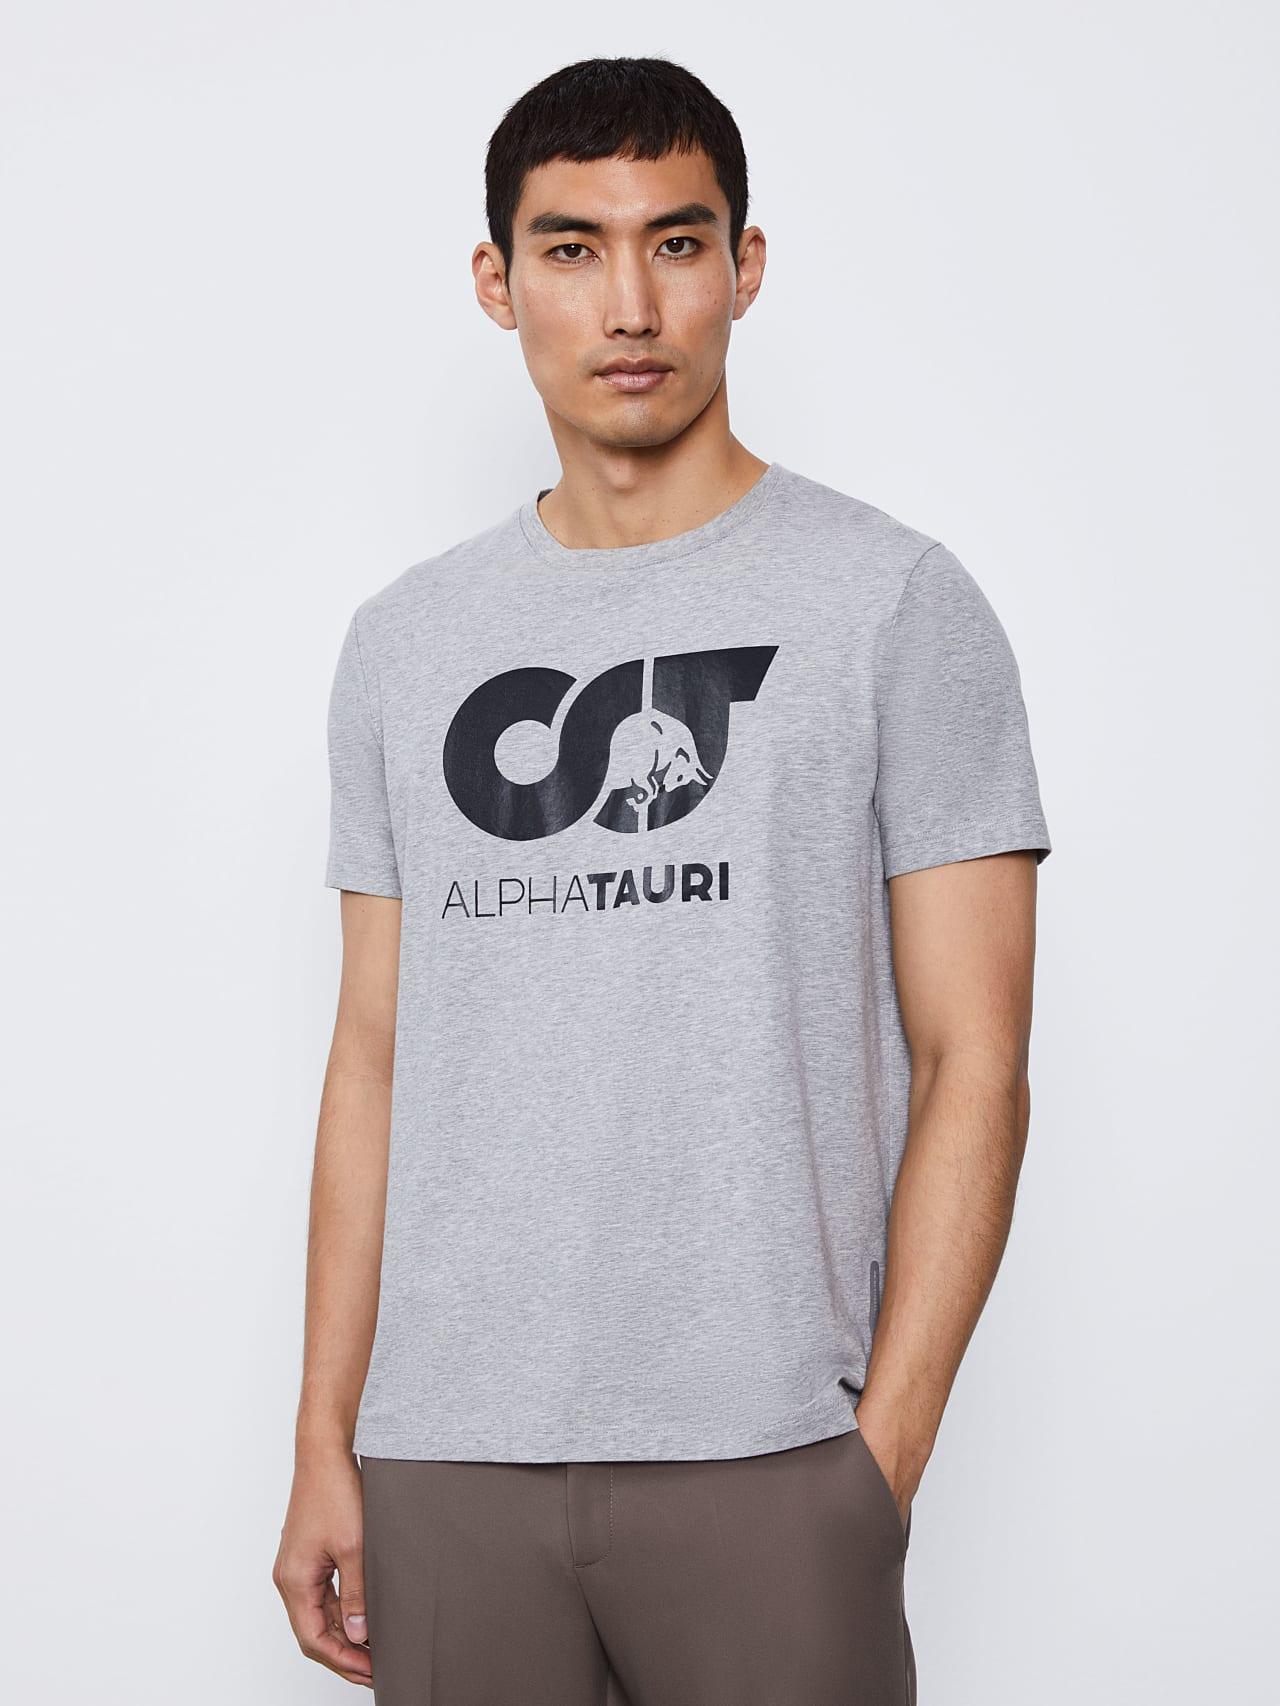 JERO V2.Y4.02 Signature Logo T-Shirt grey / melange Model shot Alpha Tauri